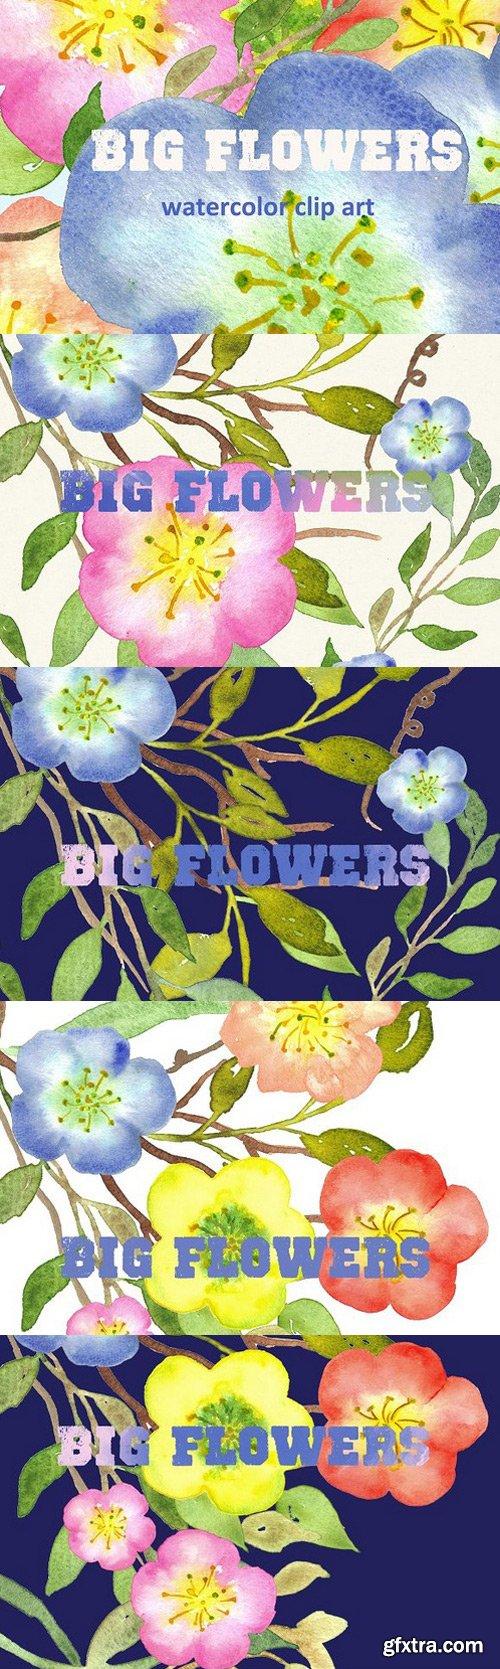 Big Flowers watercolor clip art